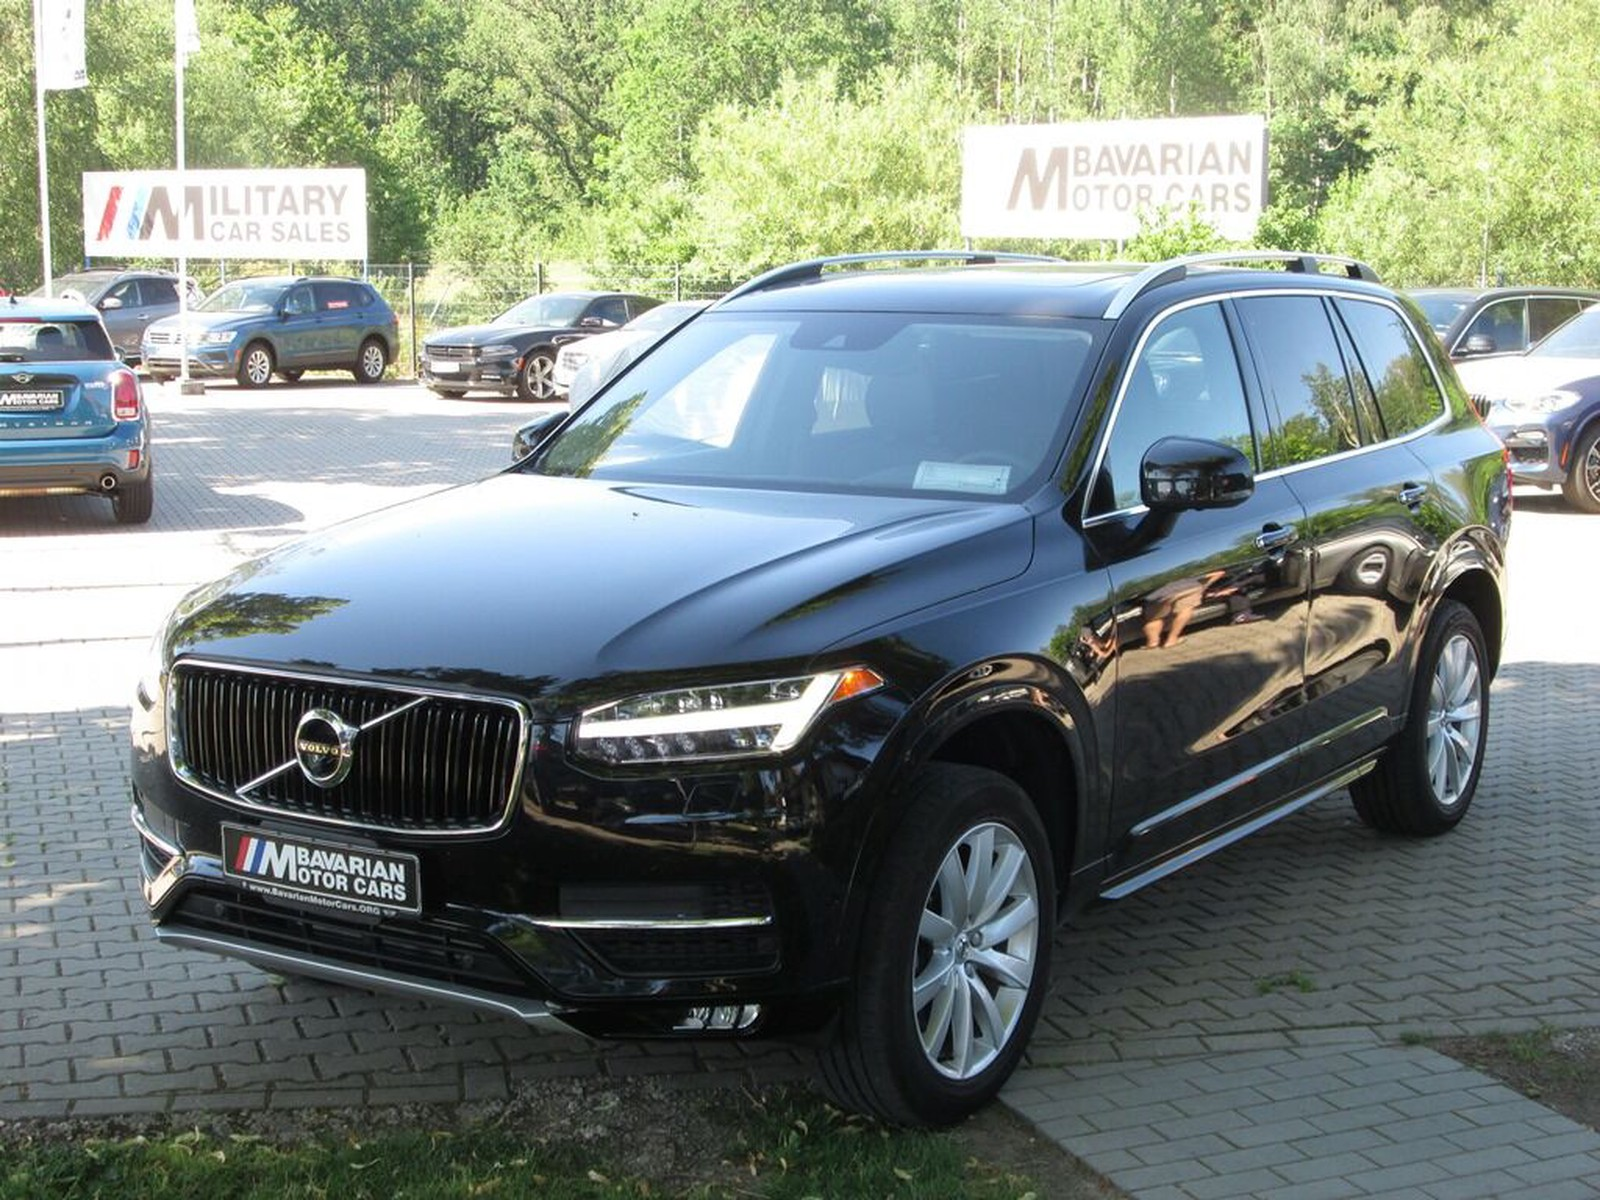 Volvo Xc90 Utility 4d T6 Momentum Awd I4 Turbo Tax Free Military Sales In Grafenwöhr Price 43700 Usd Int Nr U 15817 Sold